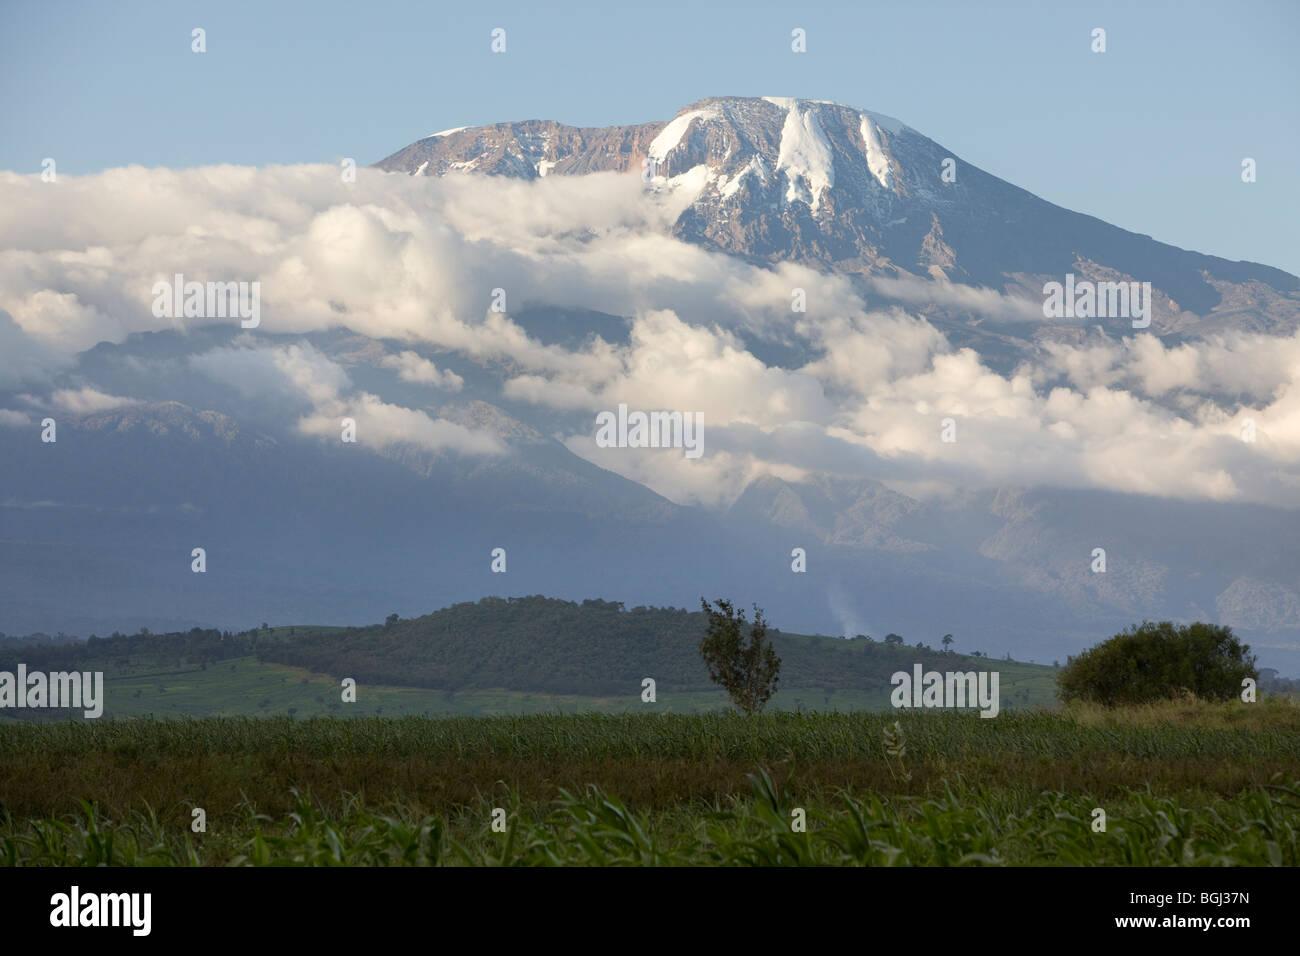 Mount Kilimanjaro's snowcapped peaks rise above farmland in Northern Tanzania. - Stock Image